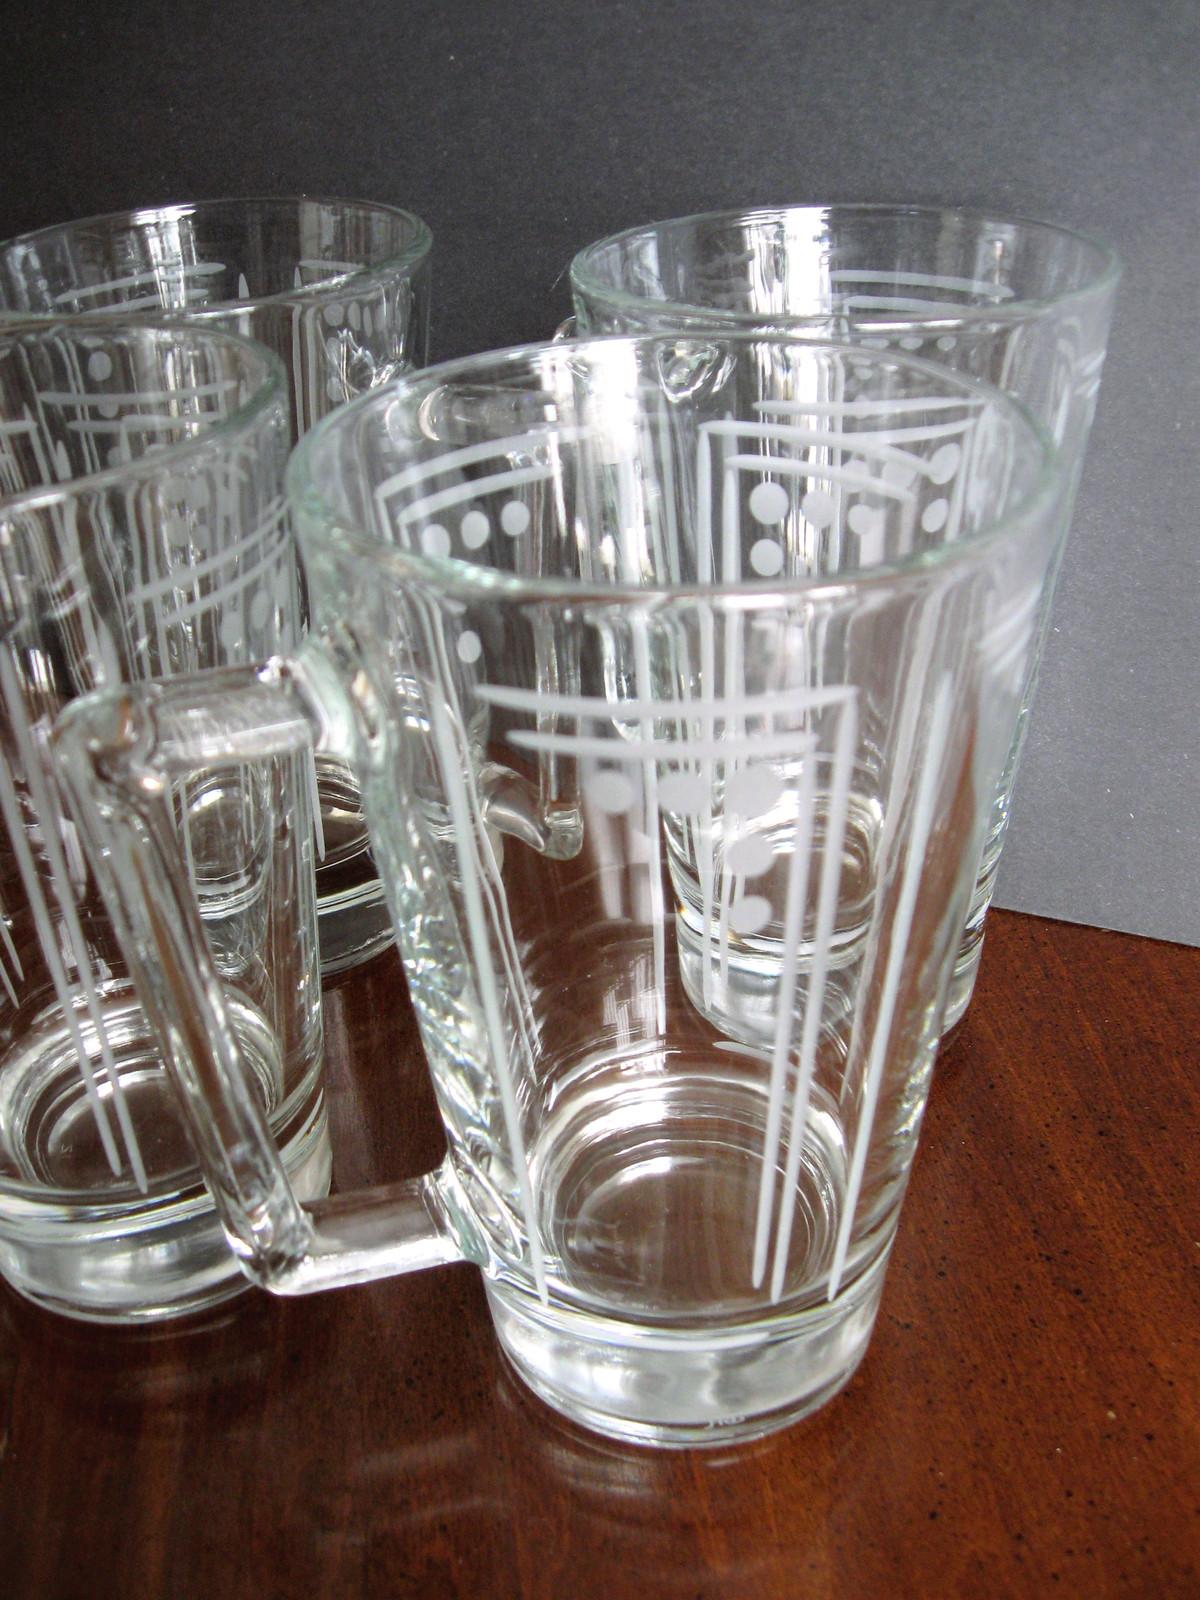 Set of Four (4) Princess House Crystal Beer Mugs - Aston Pattern